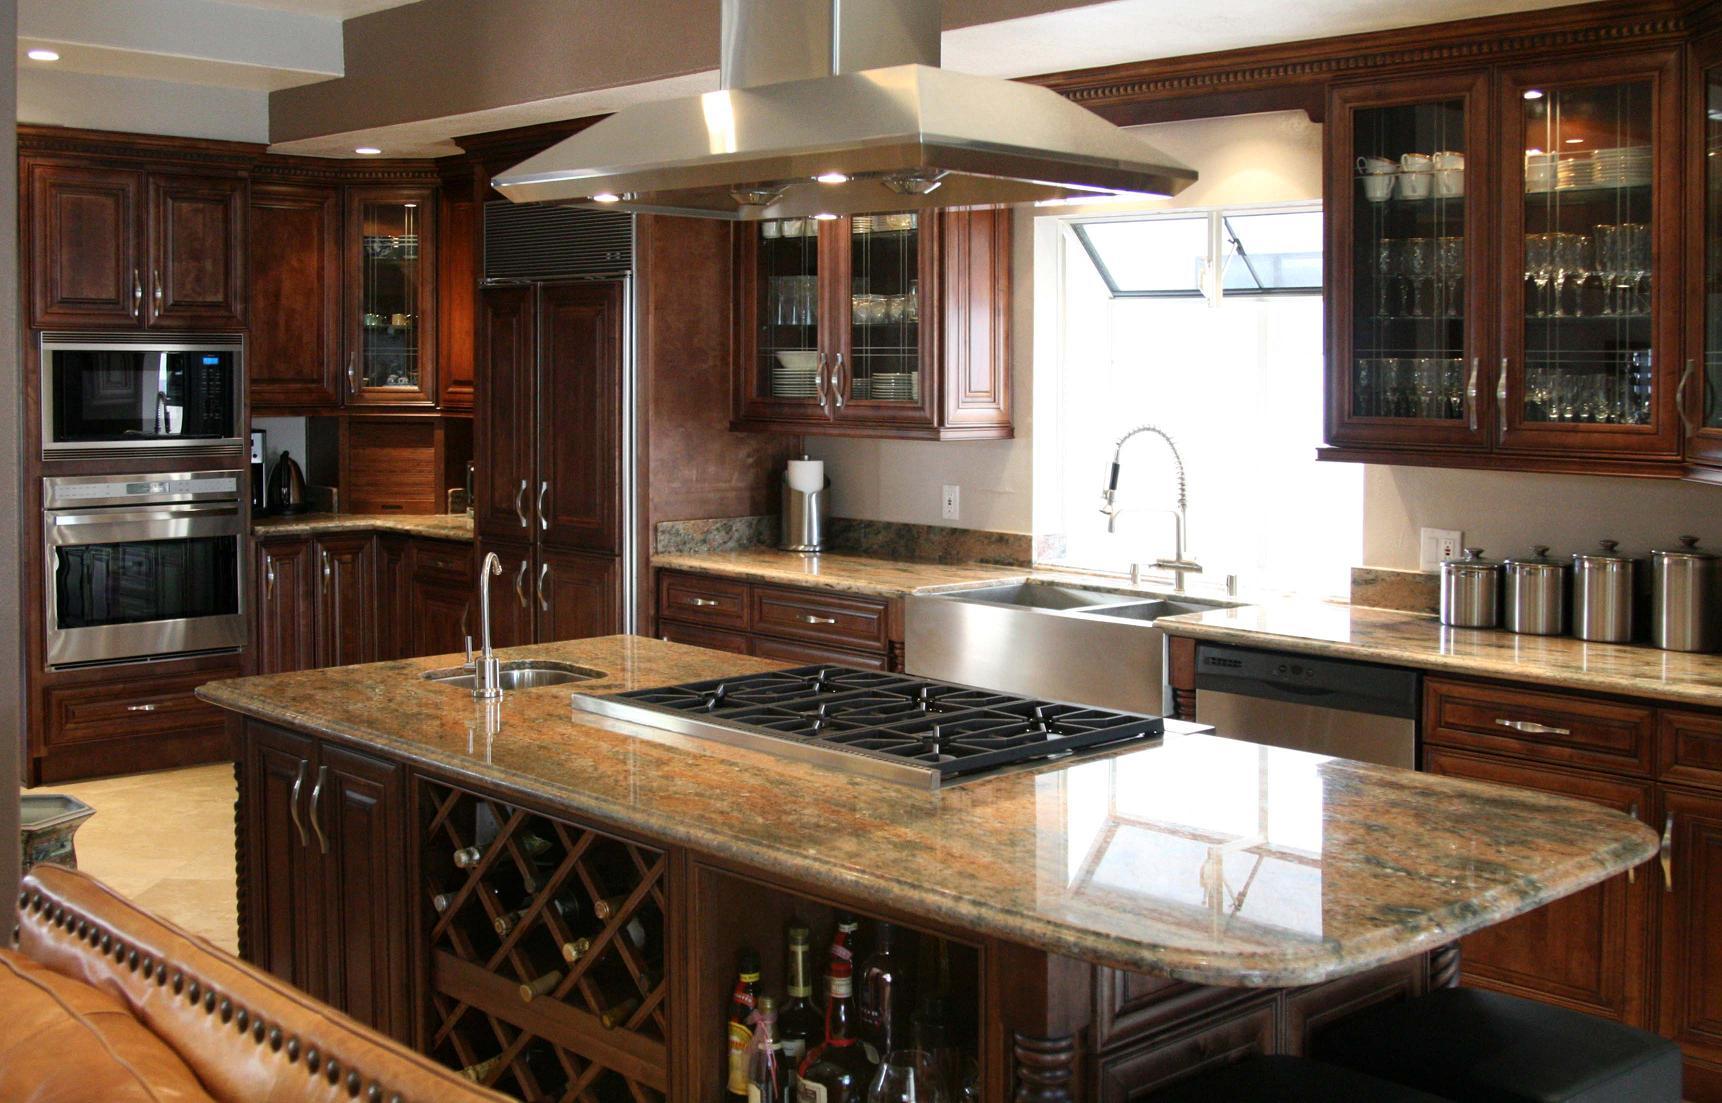 kitchen cafe decor | kitchen ideas